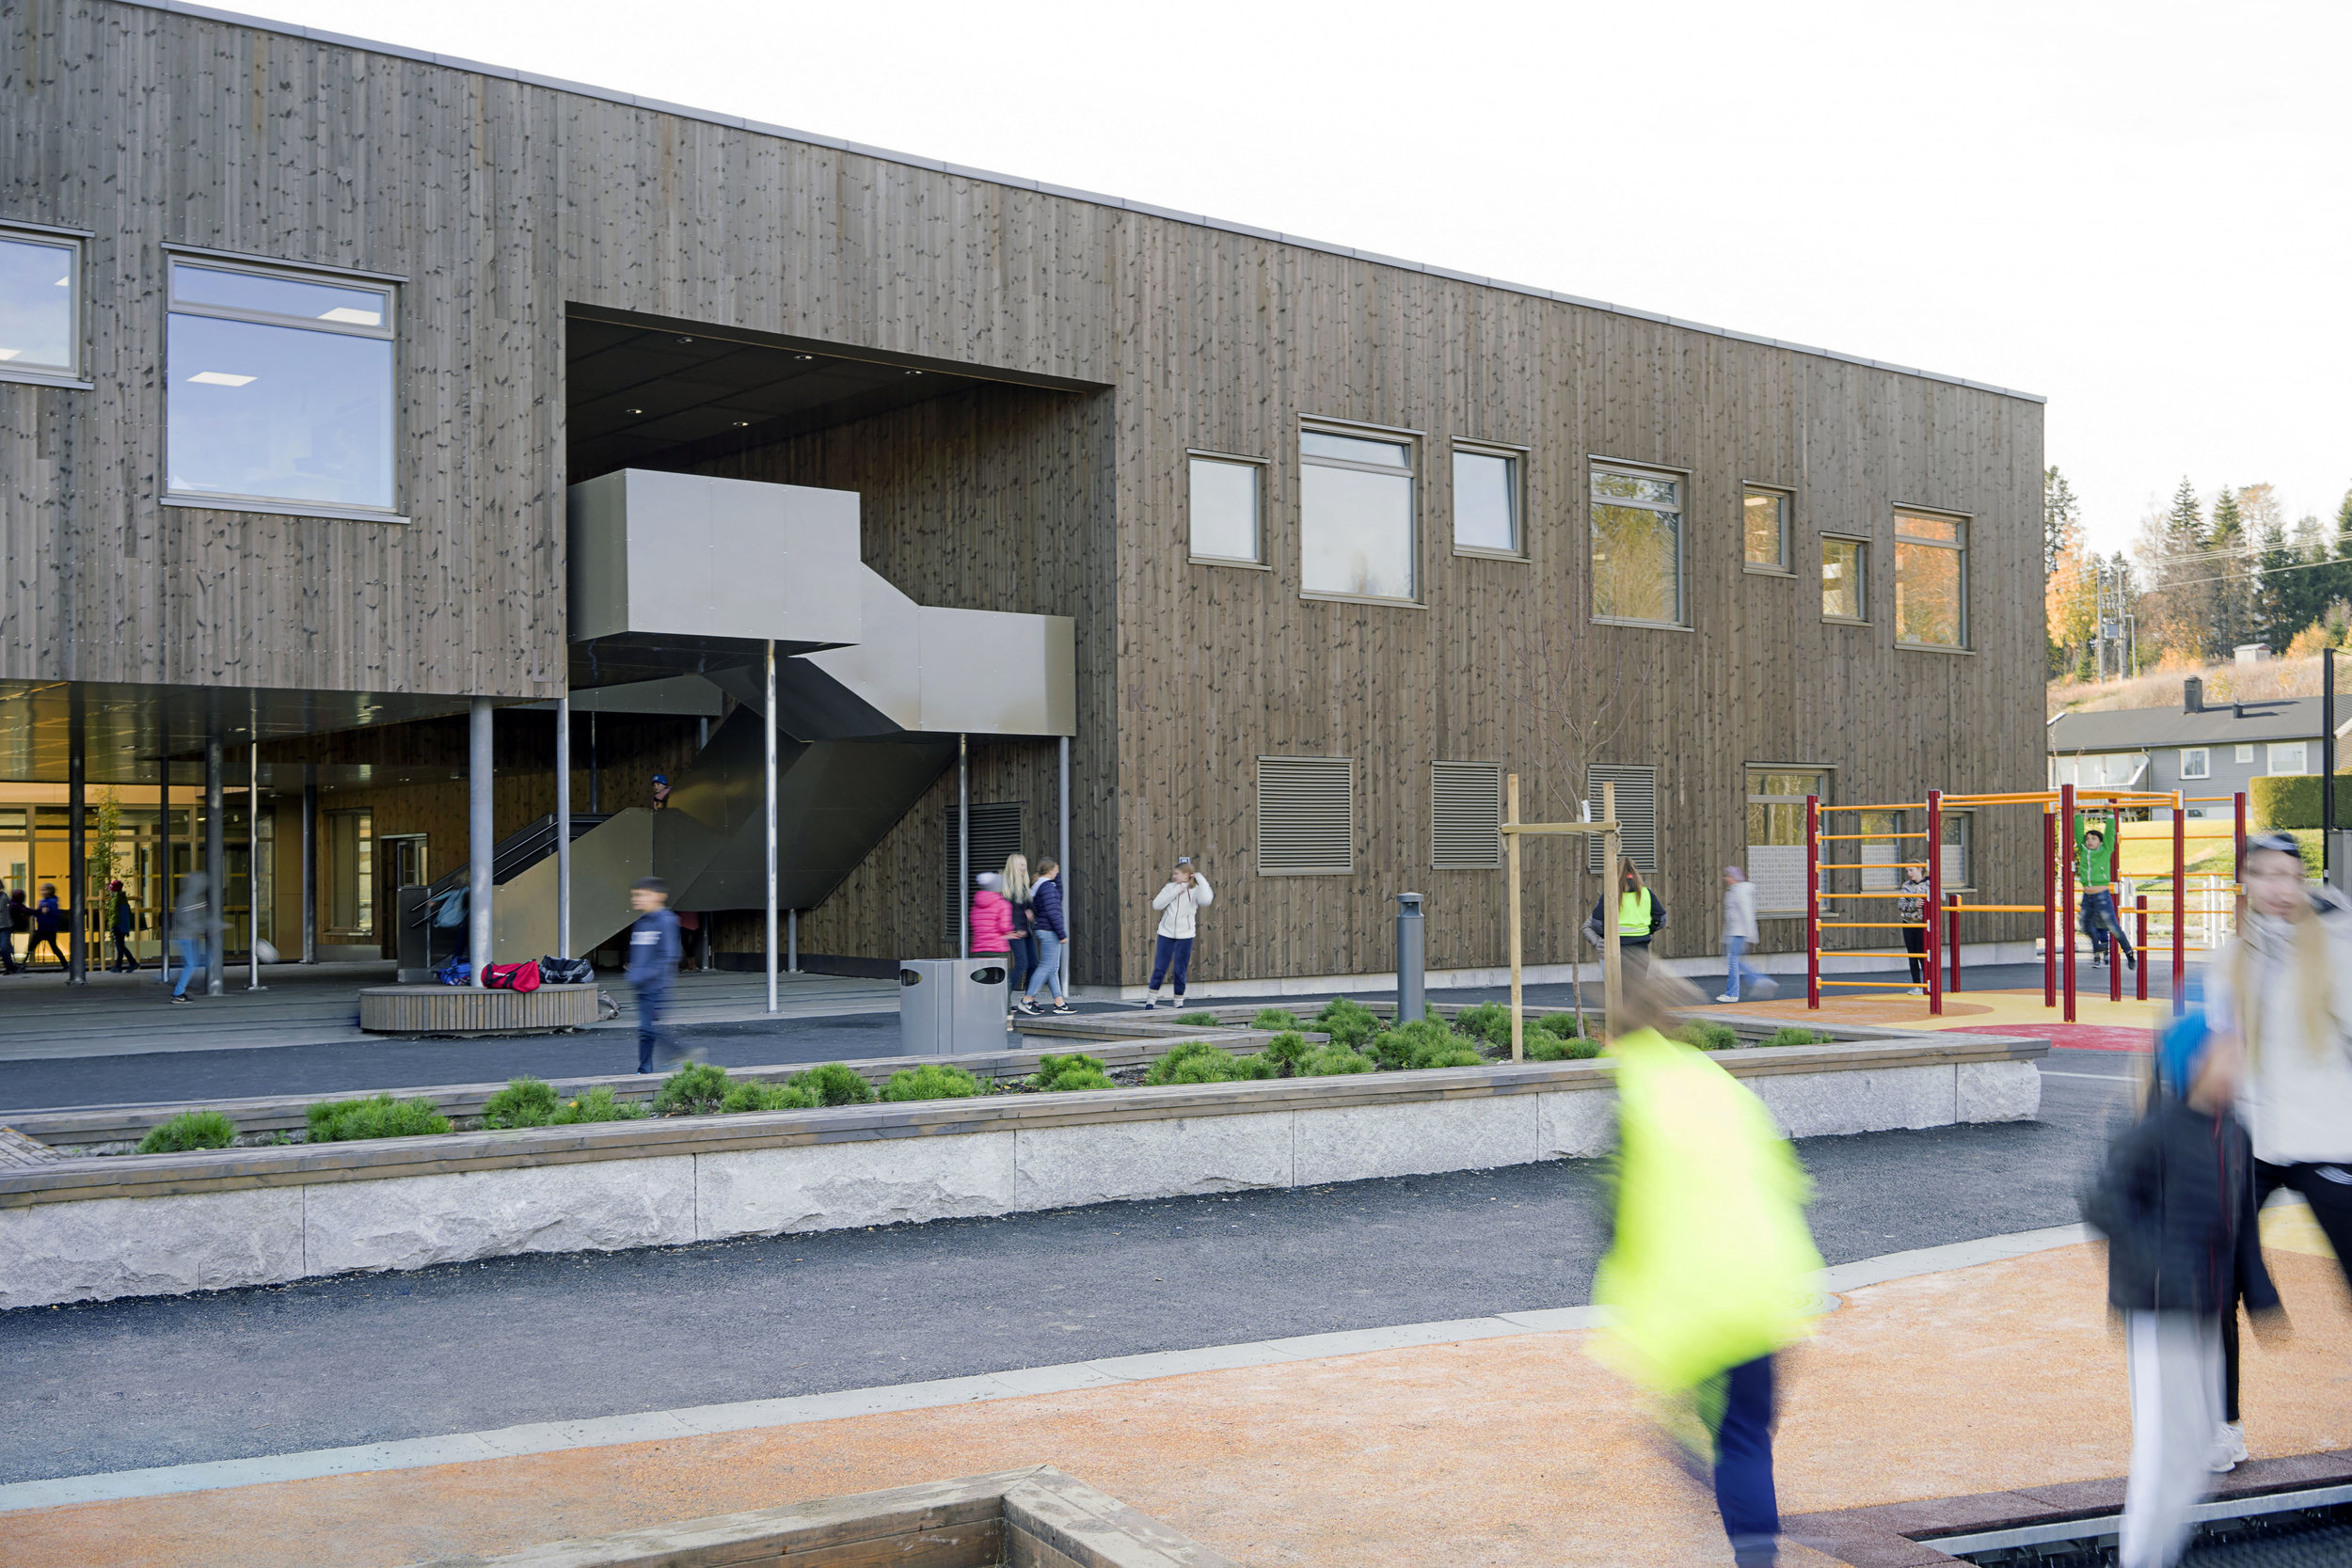 Planforum Arkitekter_Ytre Enebakk skole_Foto Eli Haugen Sandnes_Fasade 03.jpg